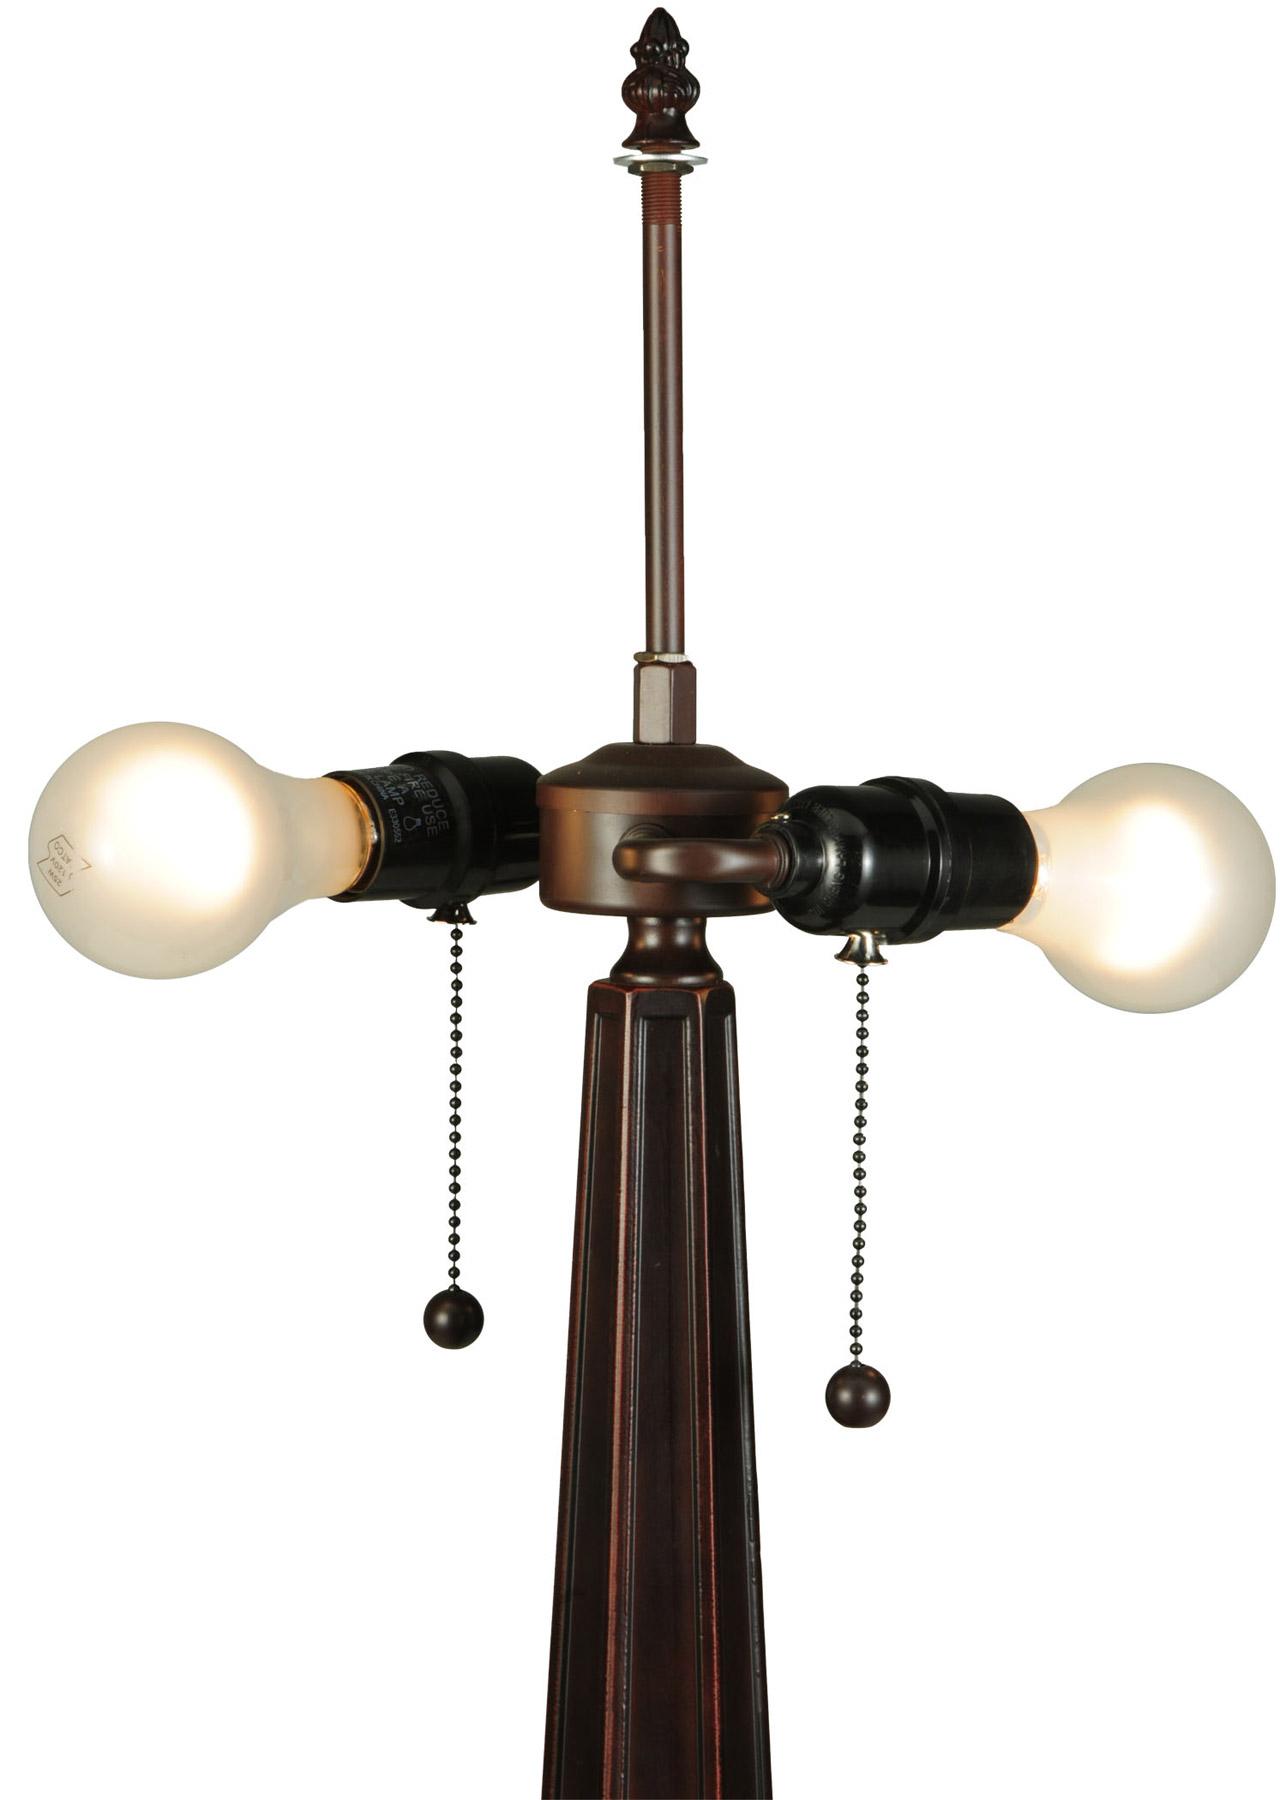 Meyda 138116 Peaches Table Lamp